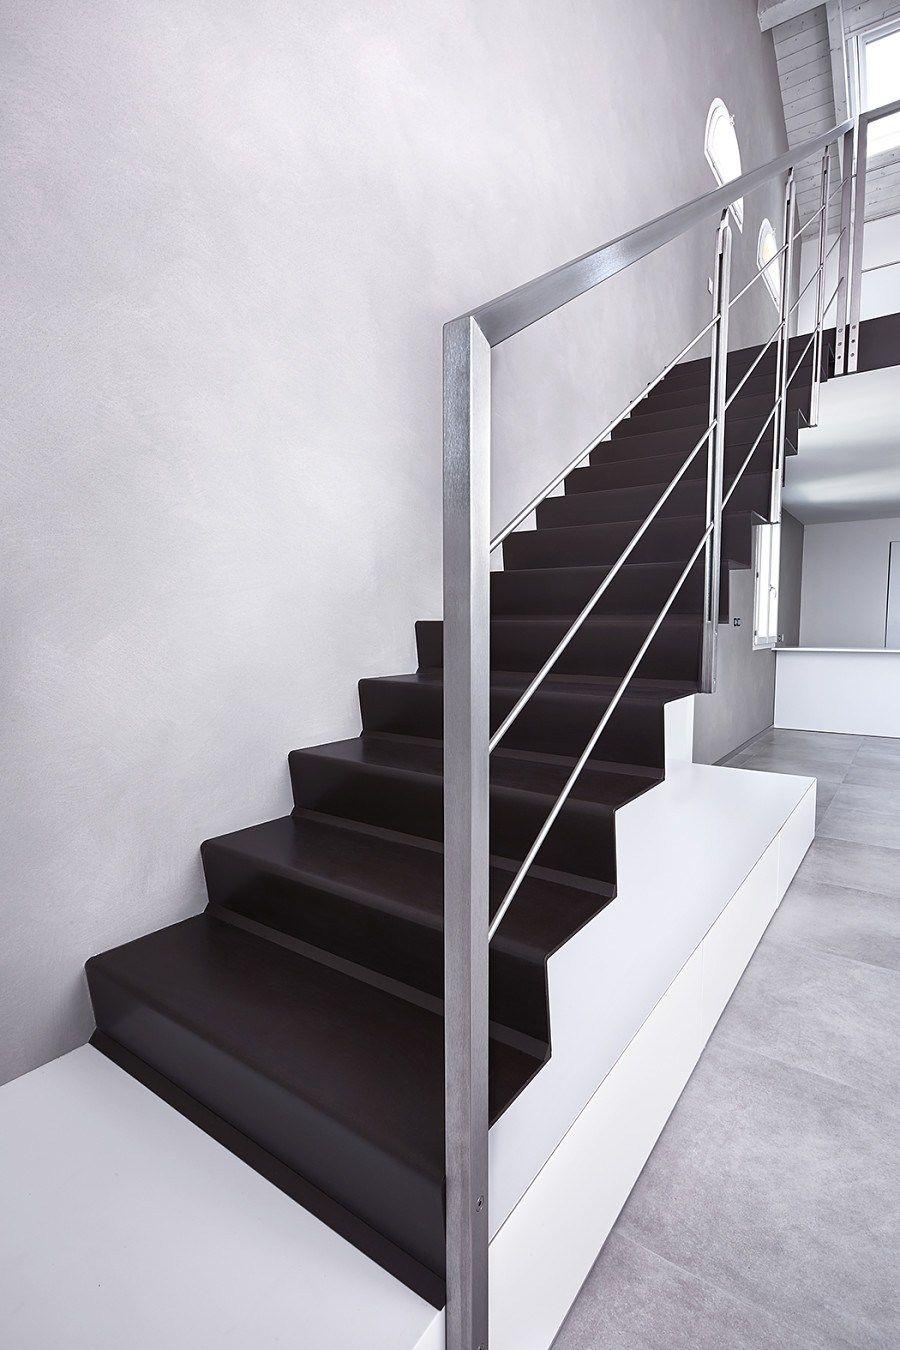 step scale sbalzo in lamiera pressopiegata per interni di